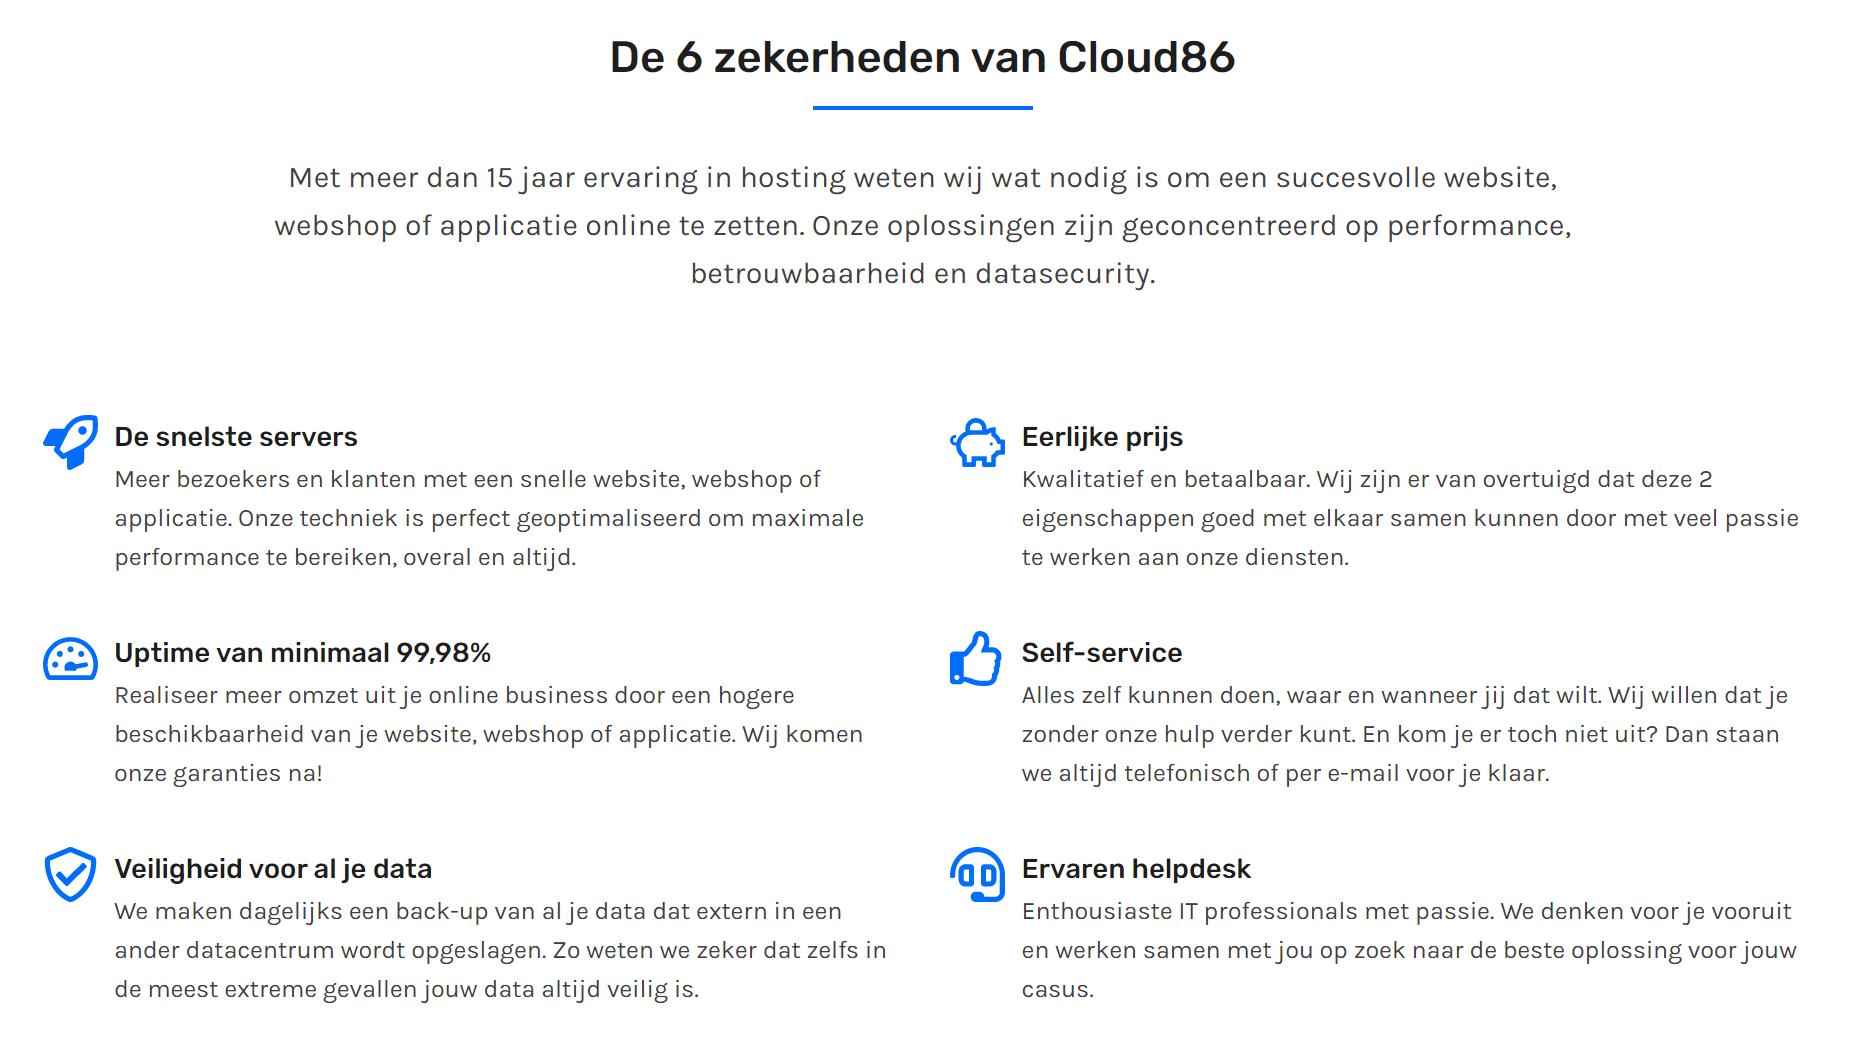 Cloud86-review-nederland